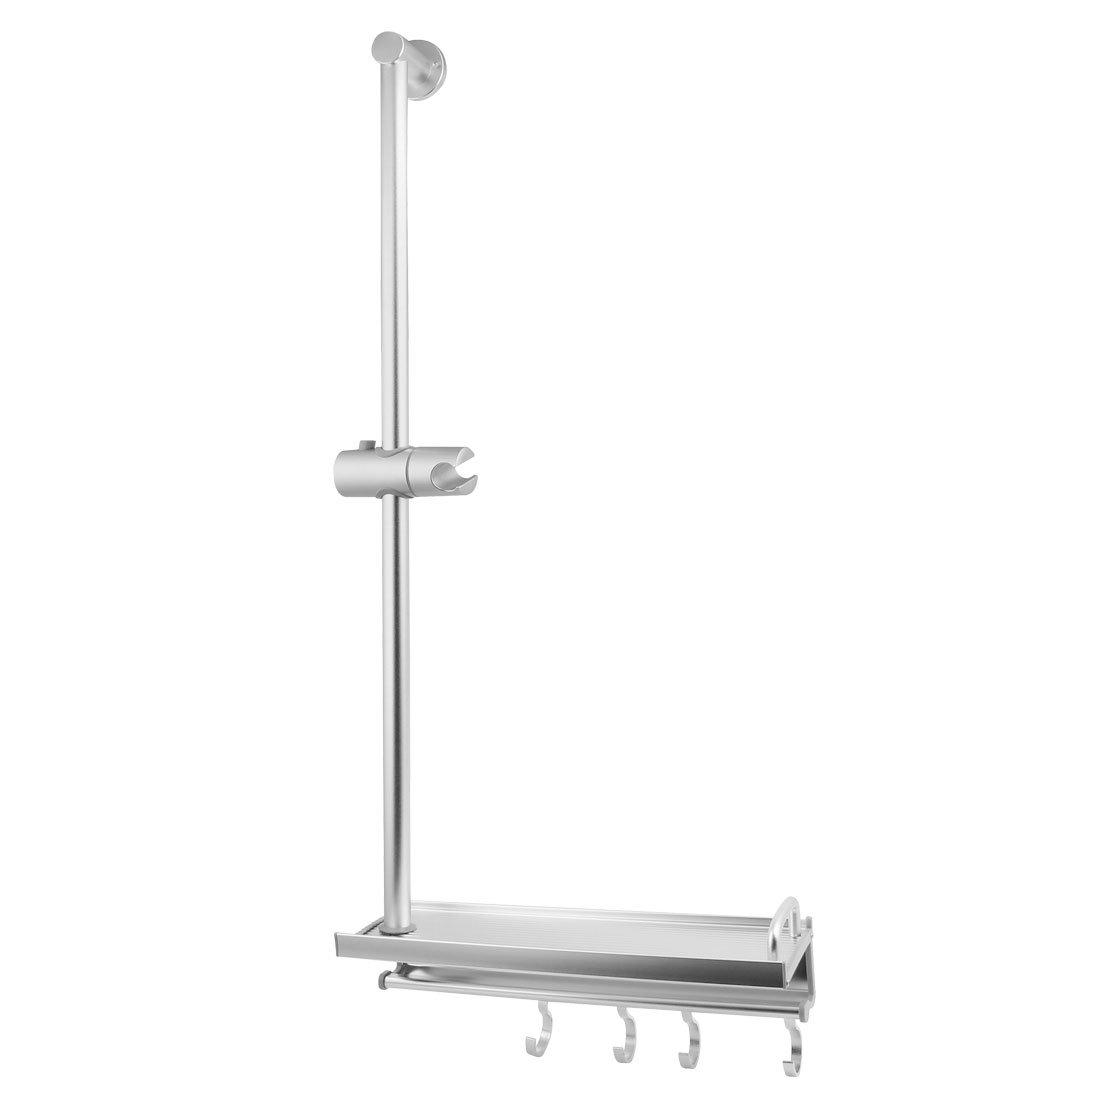 uxcell Bathroom Space Aluminum Shower Slide Bar Set Sliver Tone w 5-Hook Shelf and Screw